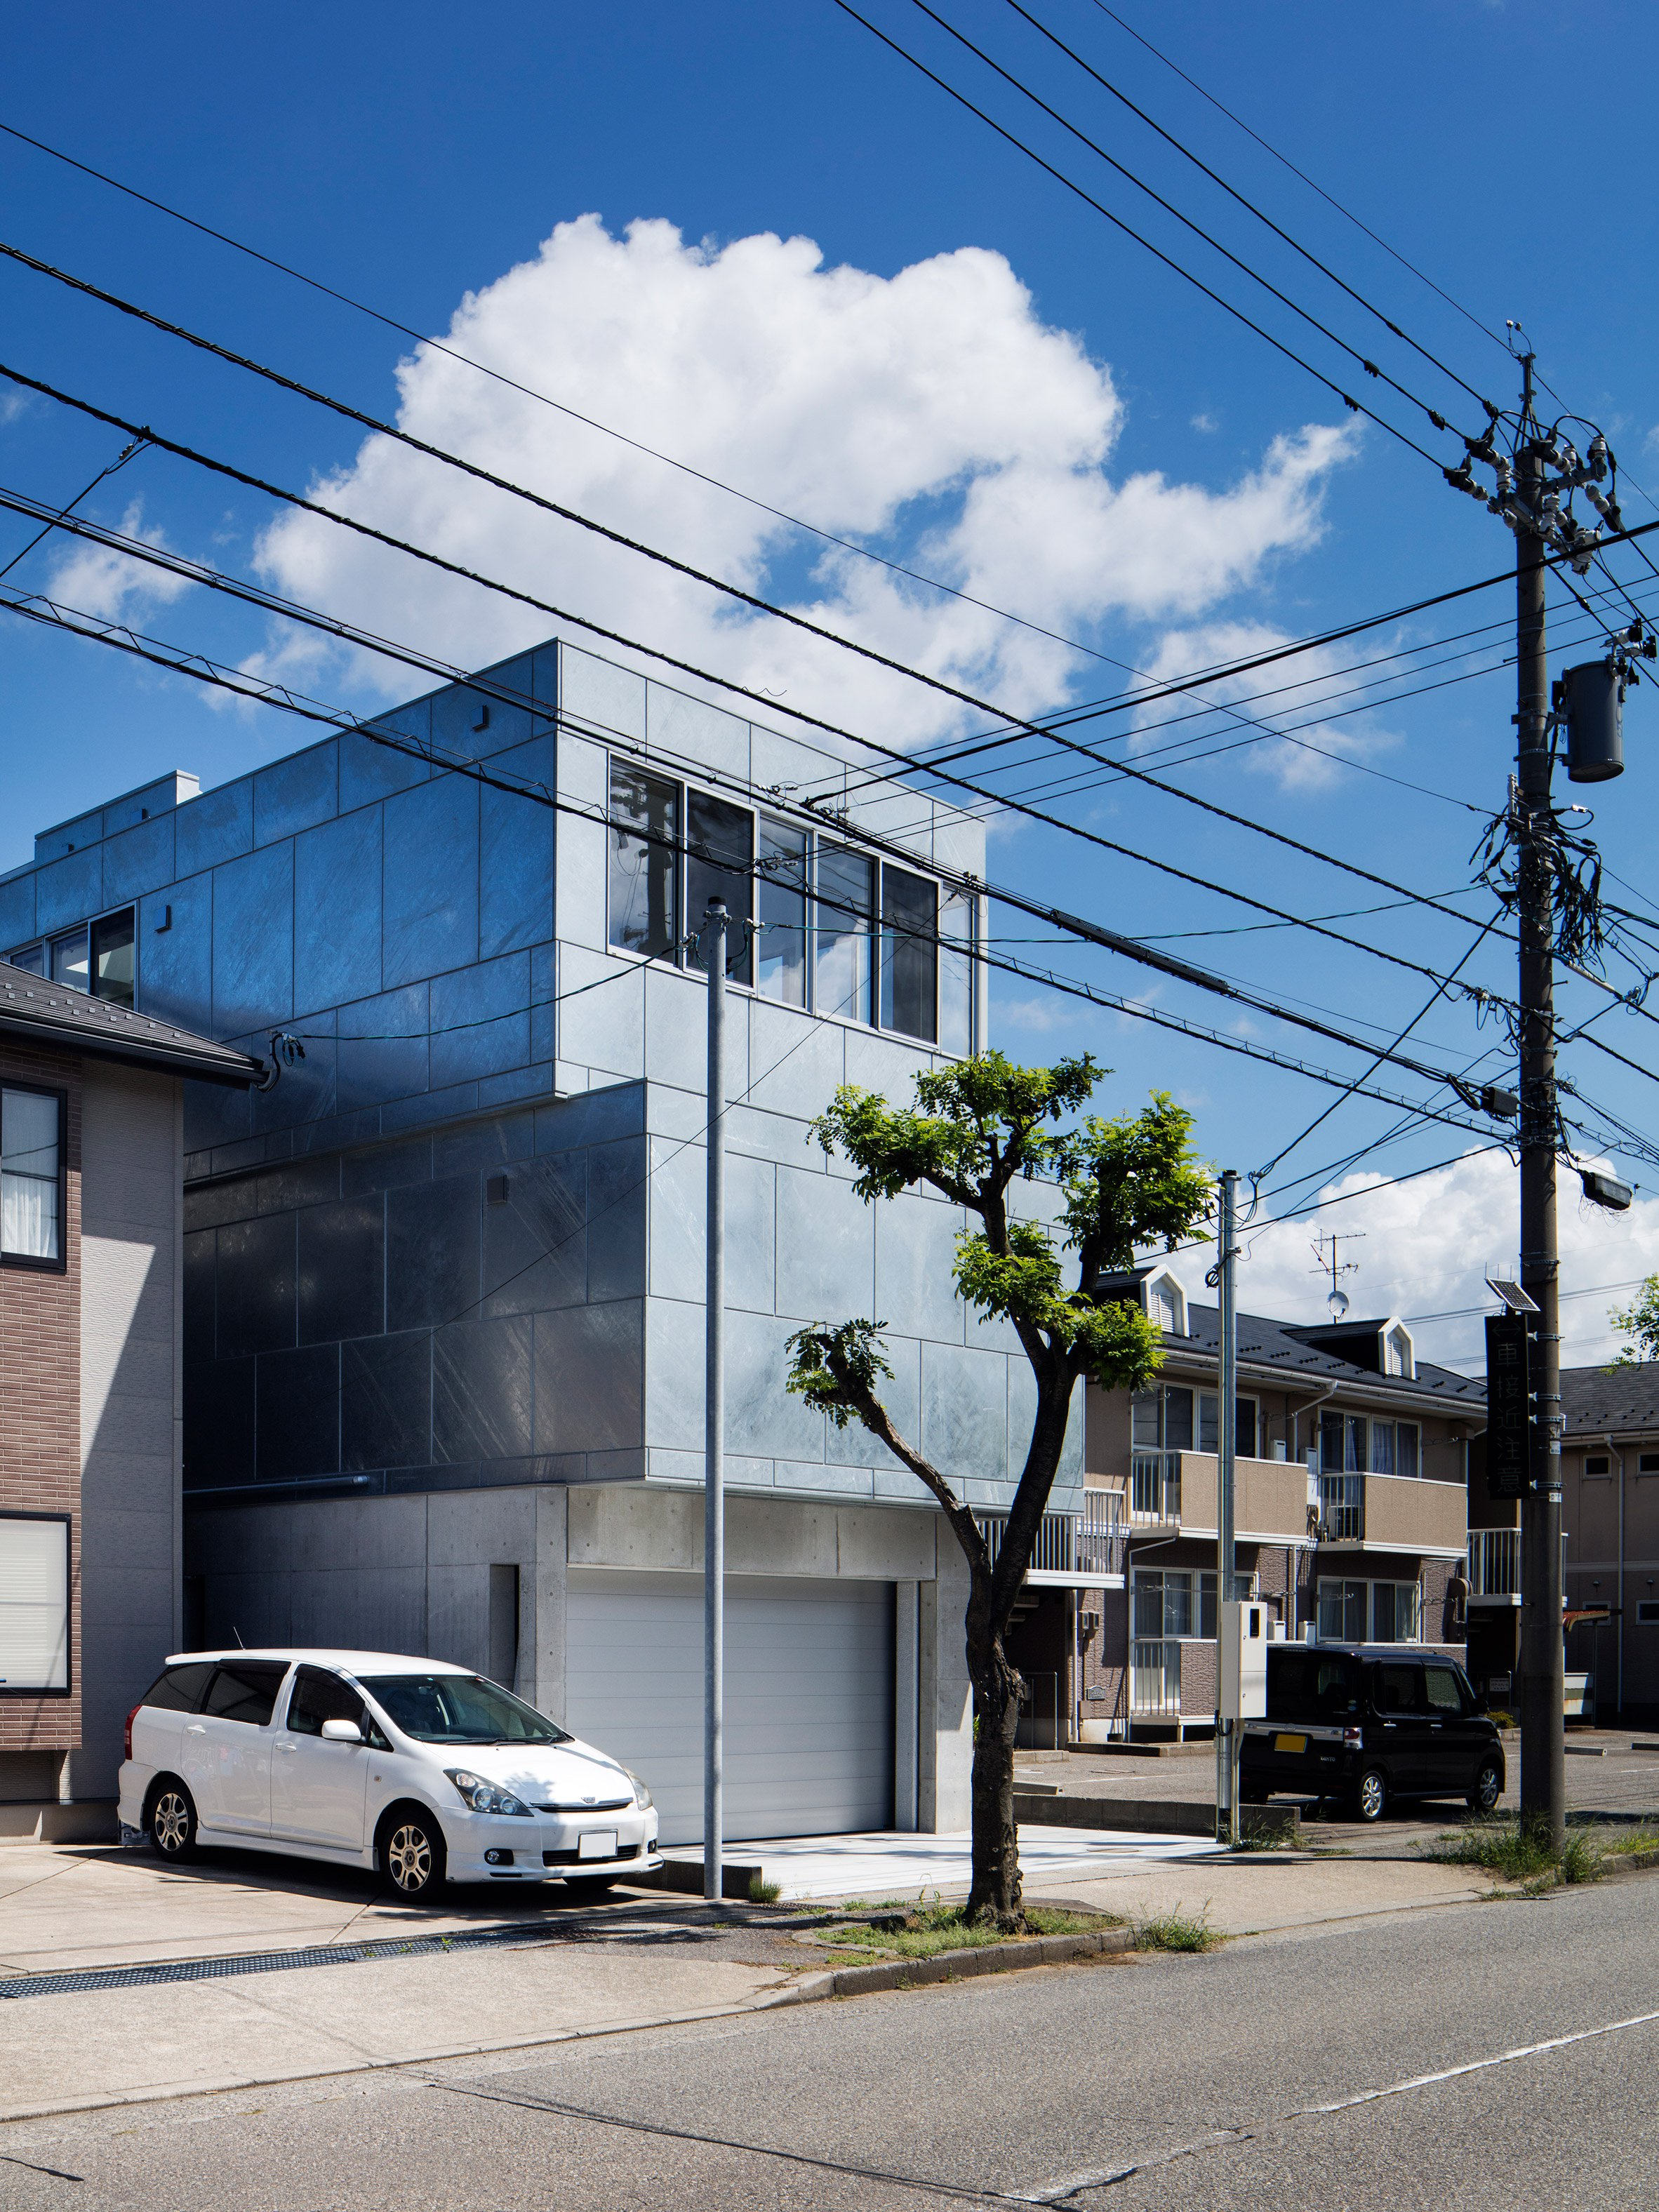 shinbohon-house-k-yuichi-yoshida-associates-architecture-residential-japan-_dezeen_2364_col_2.jpg